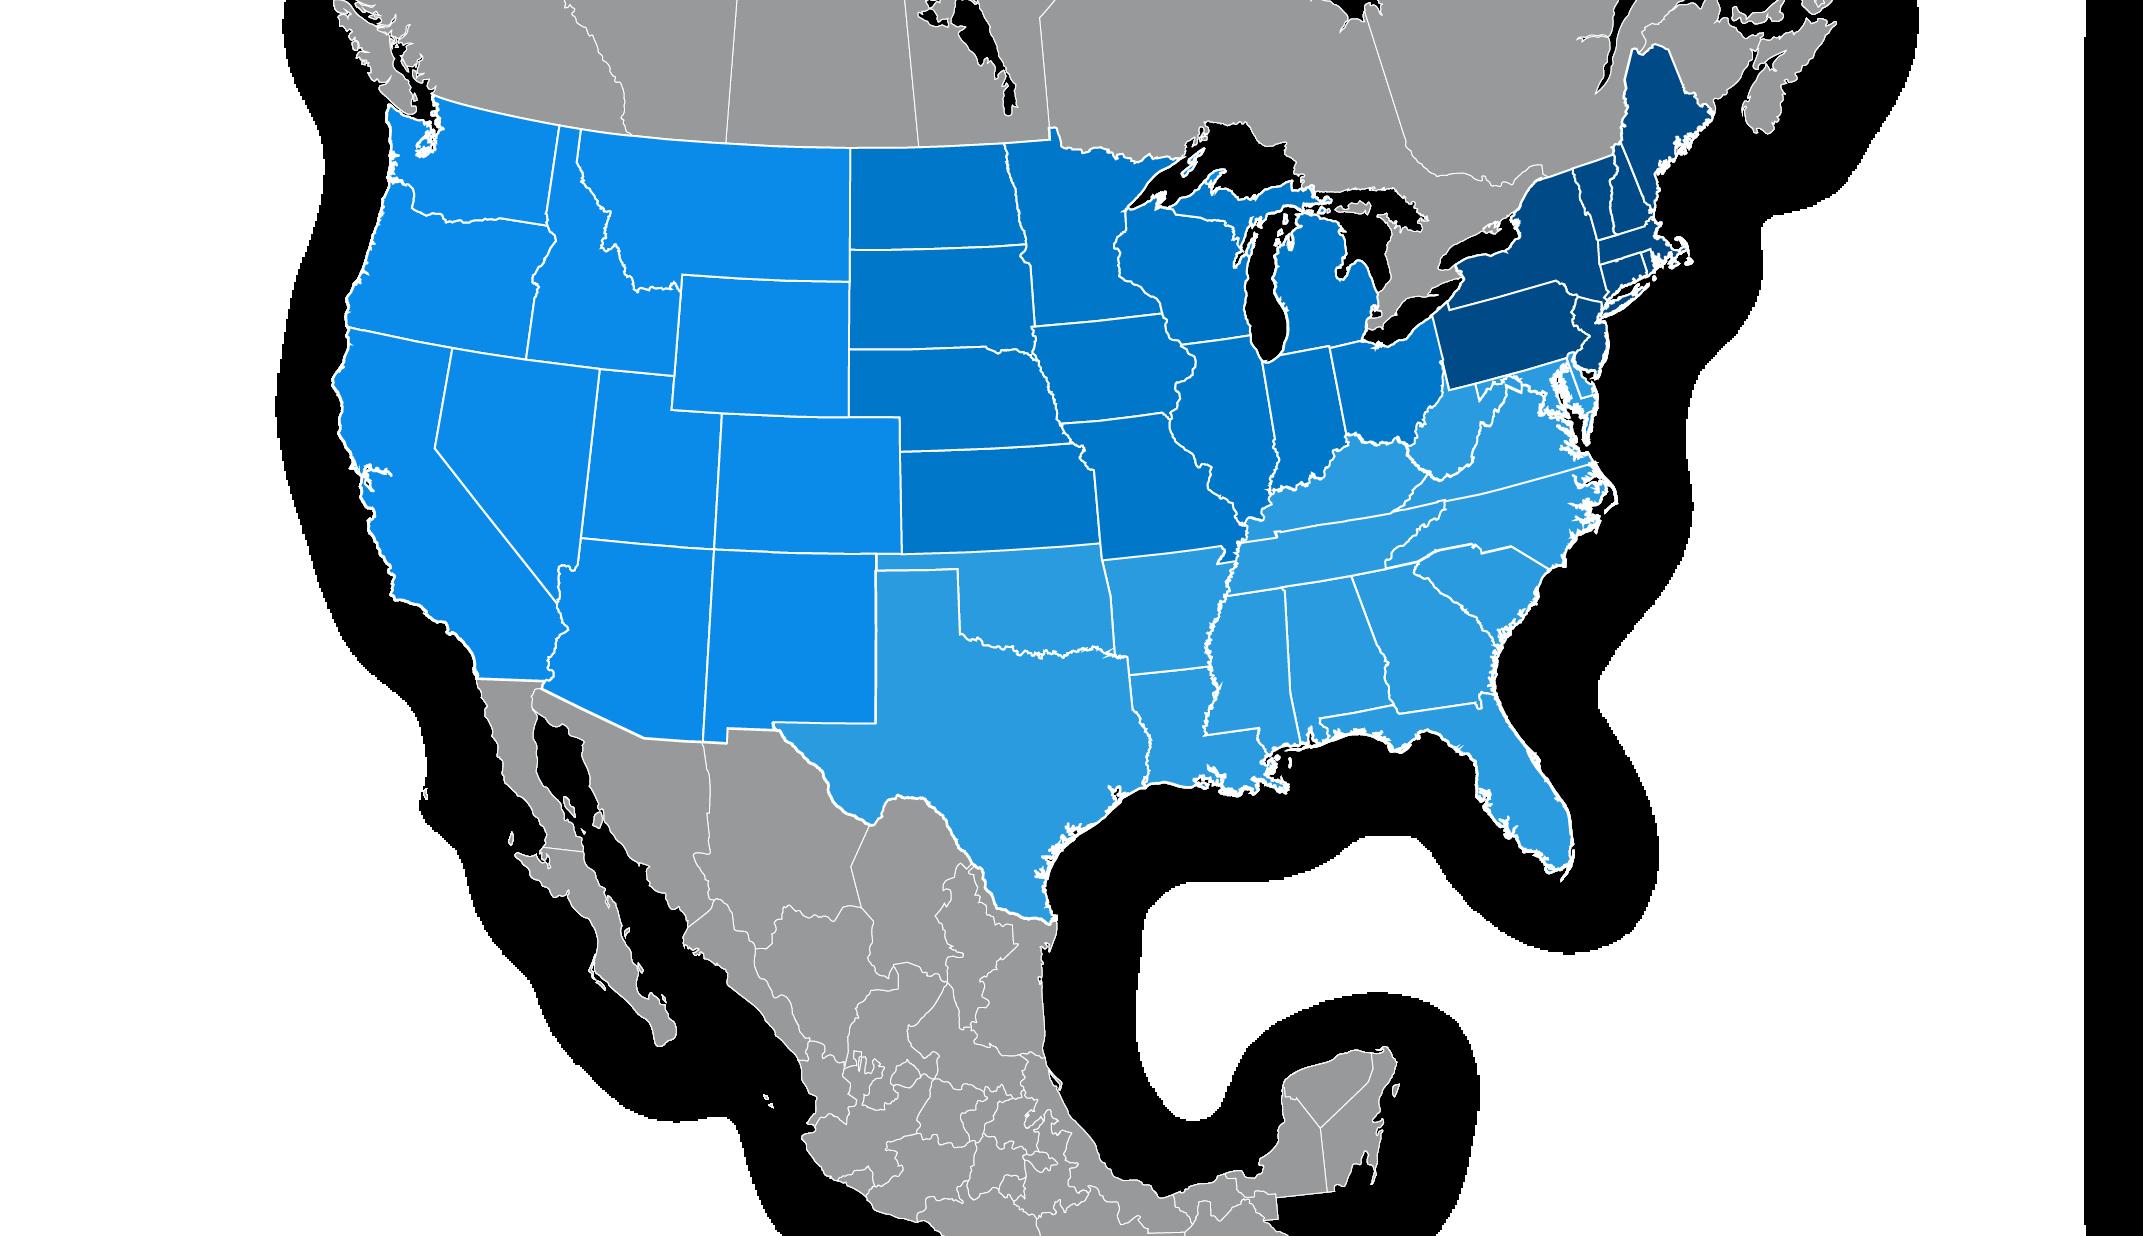 Map of the USA split into 4 regional zones